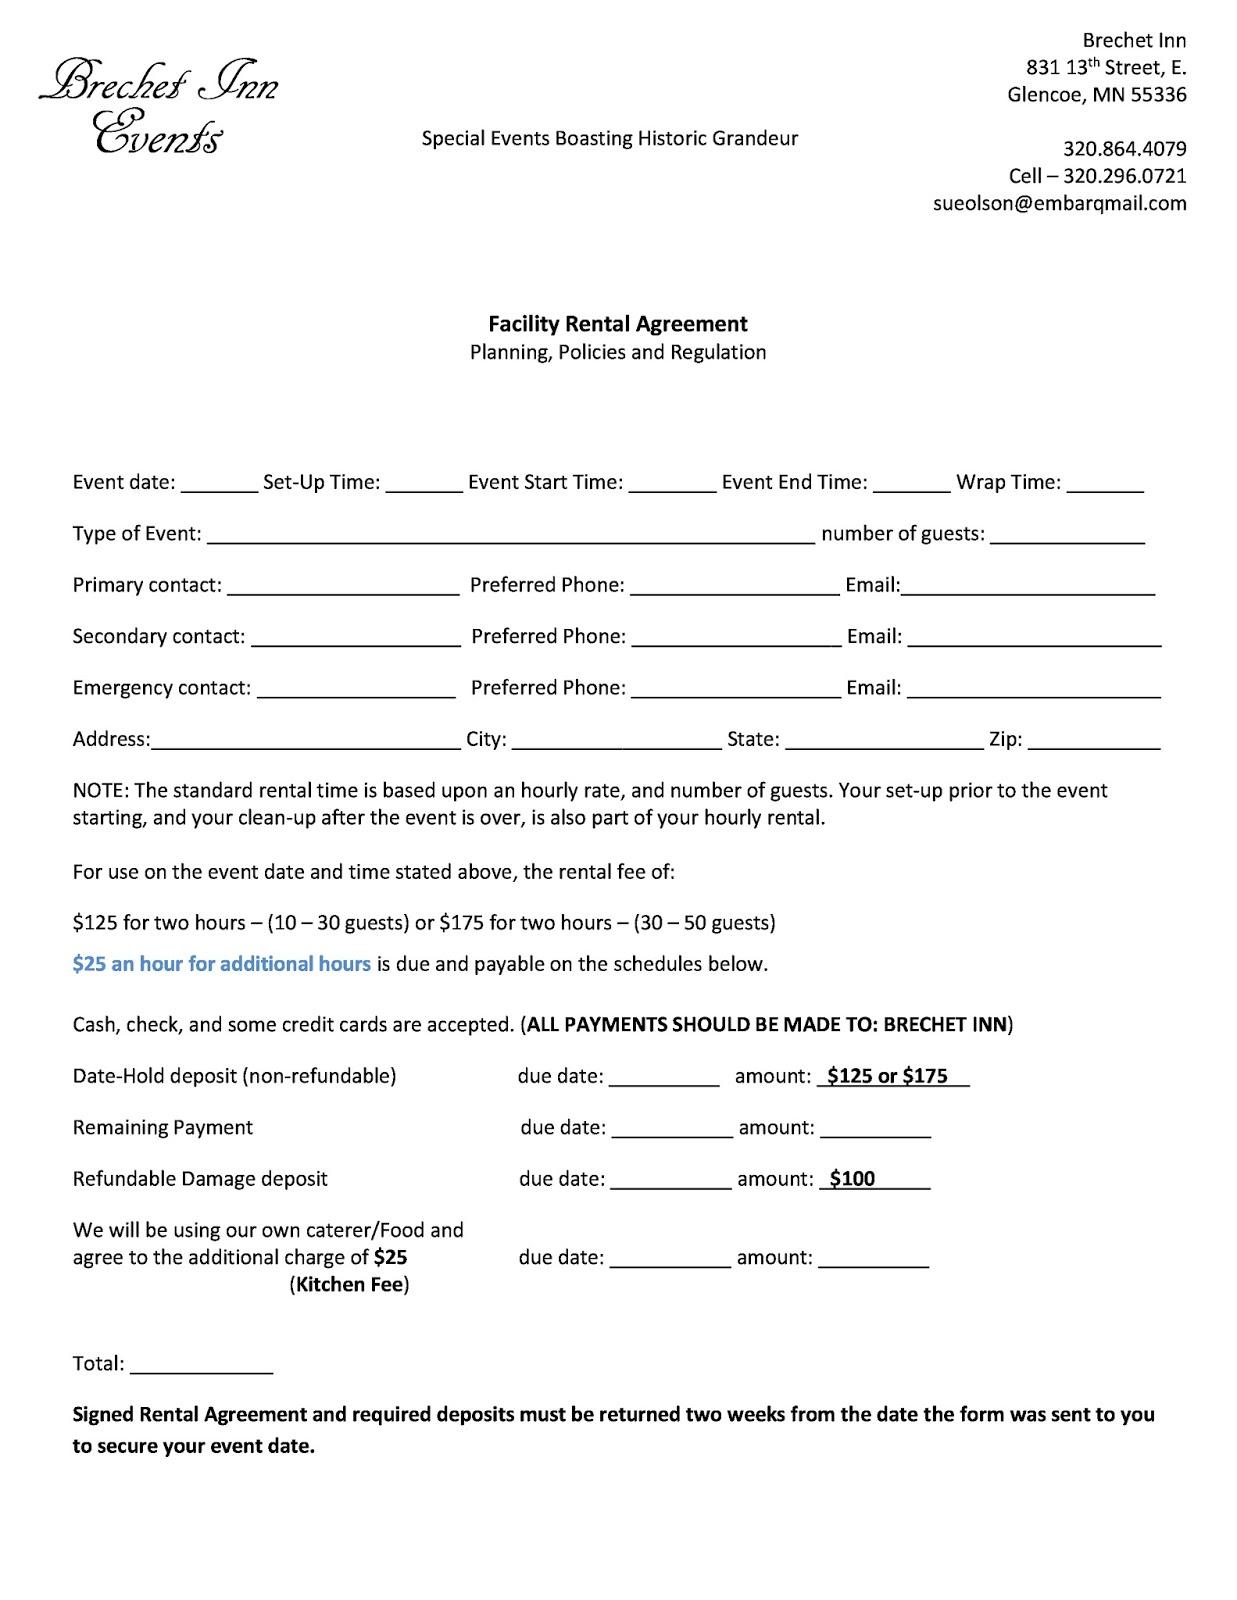 Event Rental Agreement Form